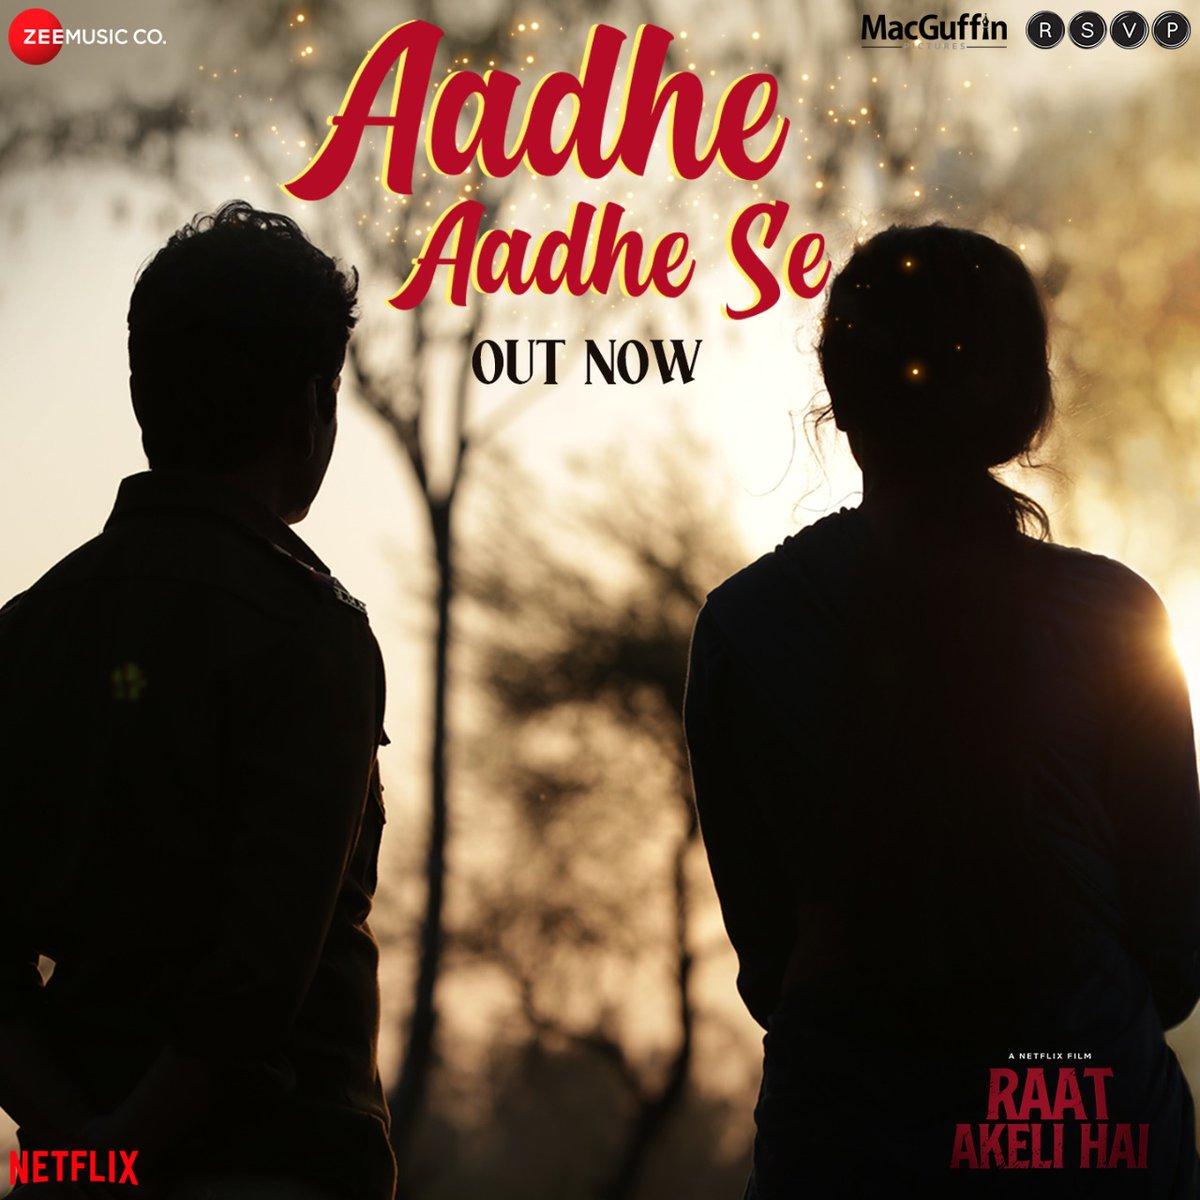 .@MikaSingh and @shilparao11s #AadheAadheSe will stir your heart up! Song out now bit.ly/AadheAadheSe 🎼 #RaatAkeliHai now streaming on @NetflixIndia @Nawazuddin_S @radhika_apte @SneKhanwalkar @rajshekharis @MacguffinP @battatawada @RonnieScrewvala @HoneyTrehan